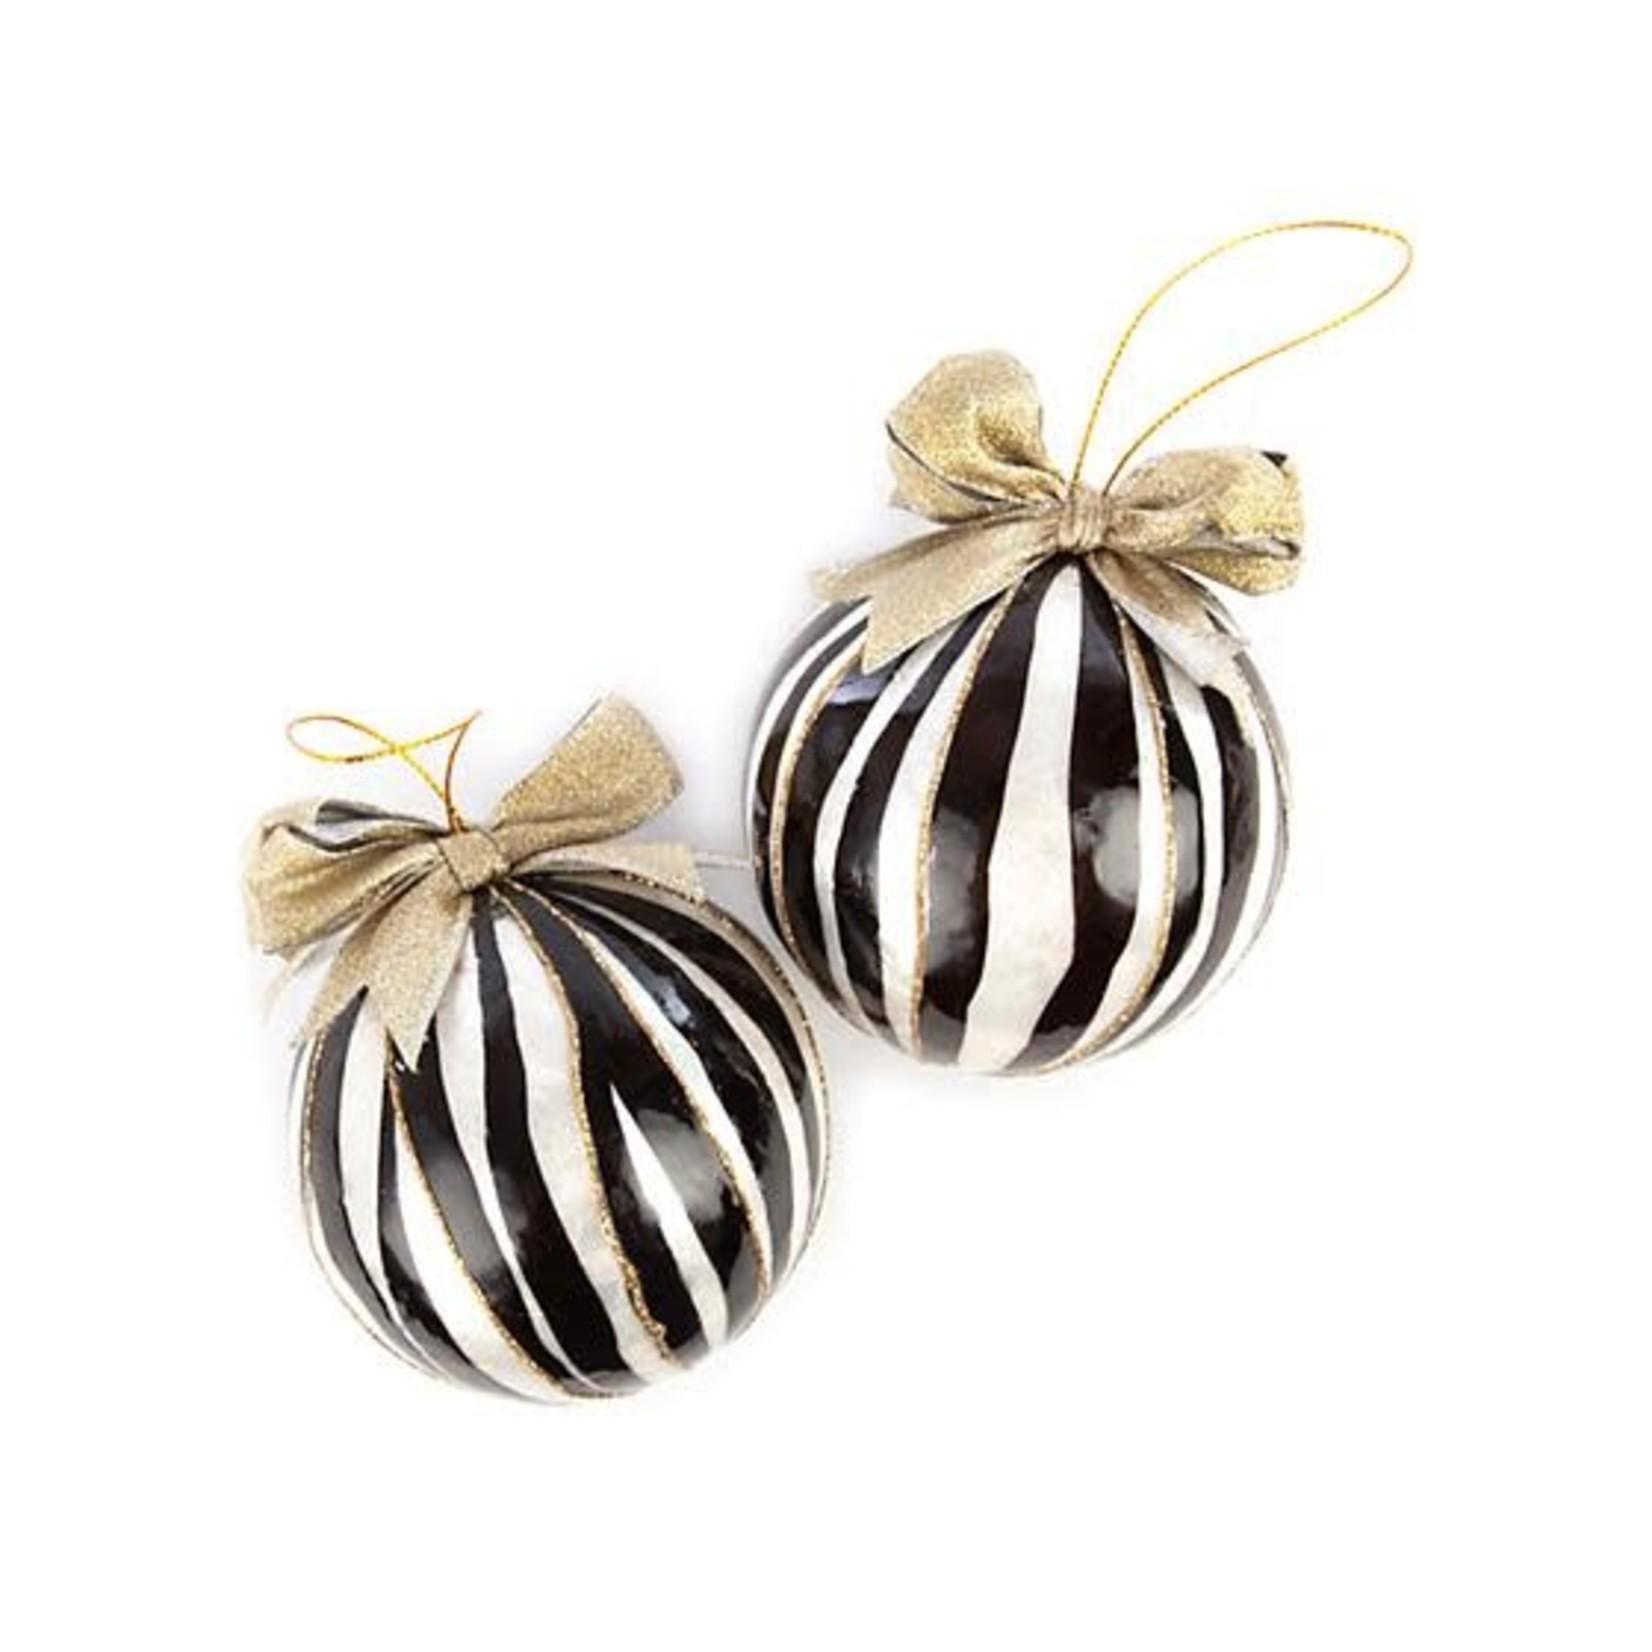 MacKenzie Childs Zebra Capiz Ball Ornaments - Set of 2